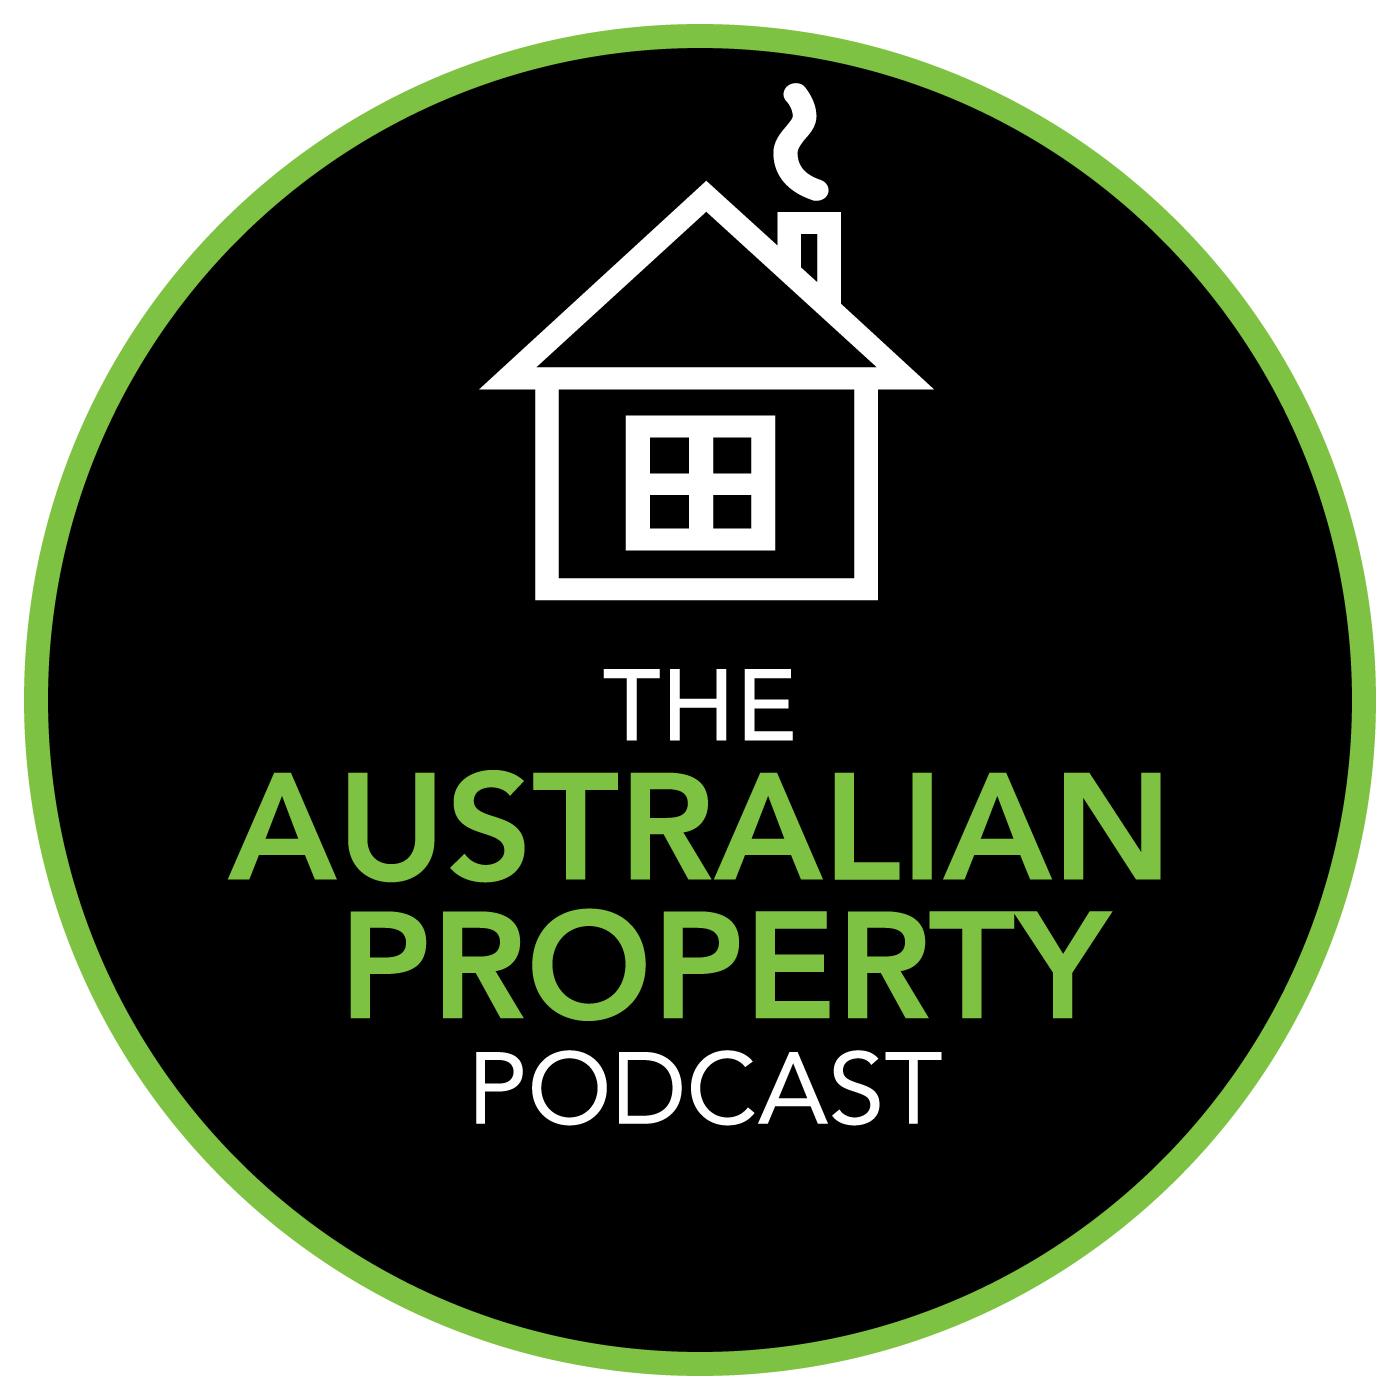 Australian Property Podcast | Listen via Stitcher for Podcasts